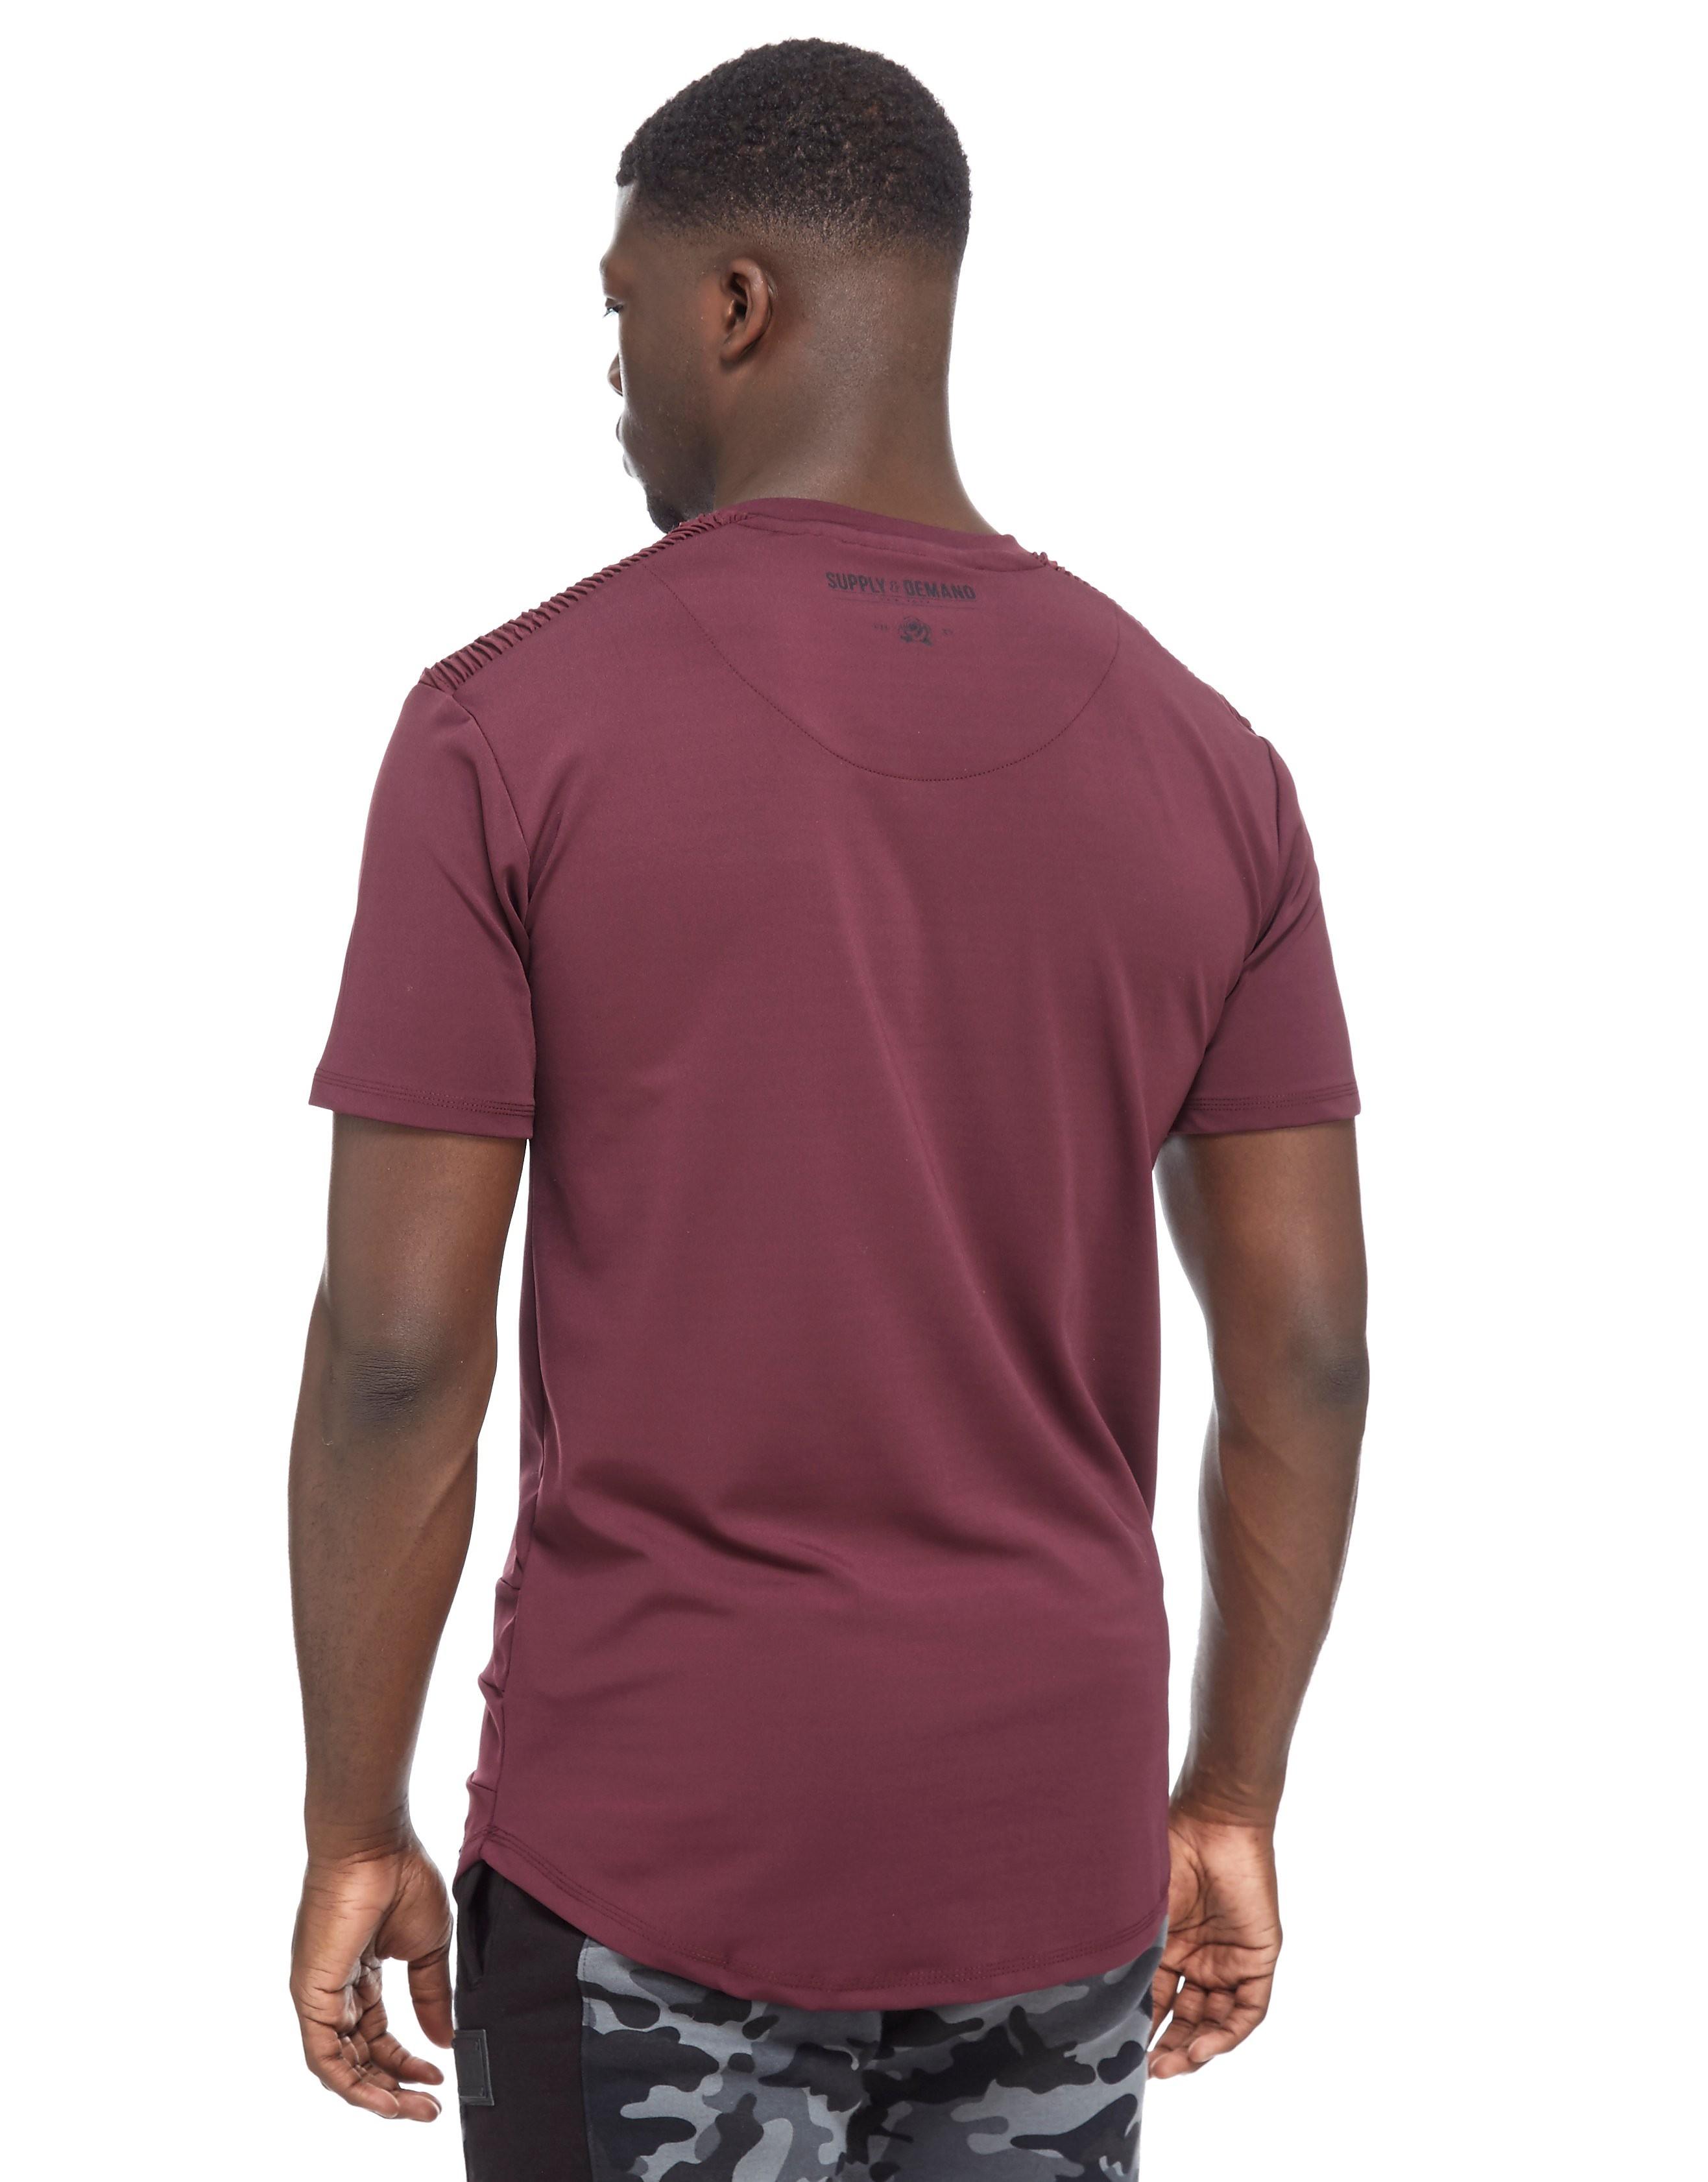 Supply & Demand Sleepy Gothic T-Shirt